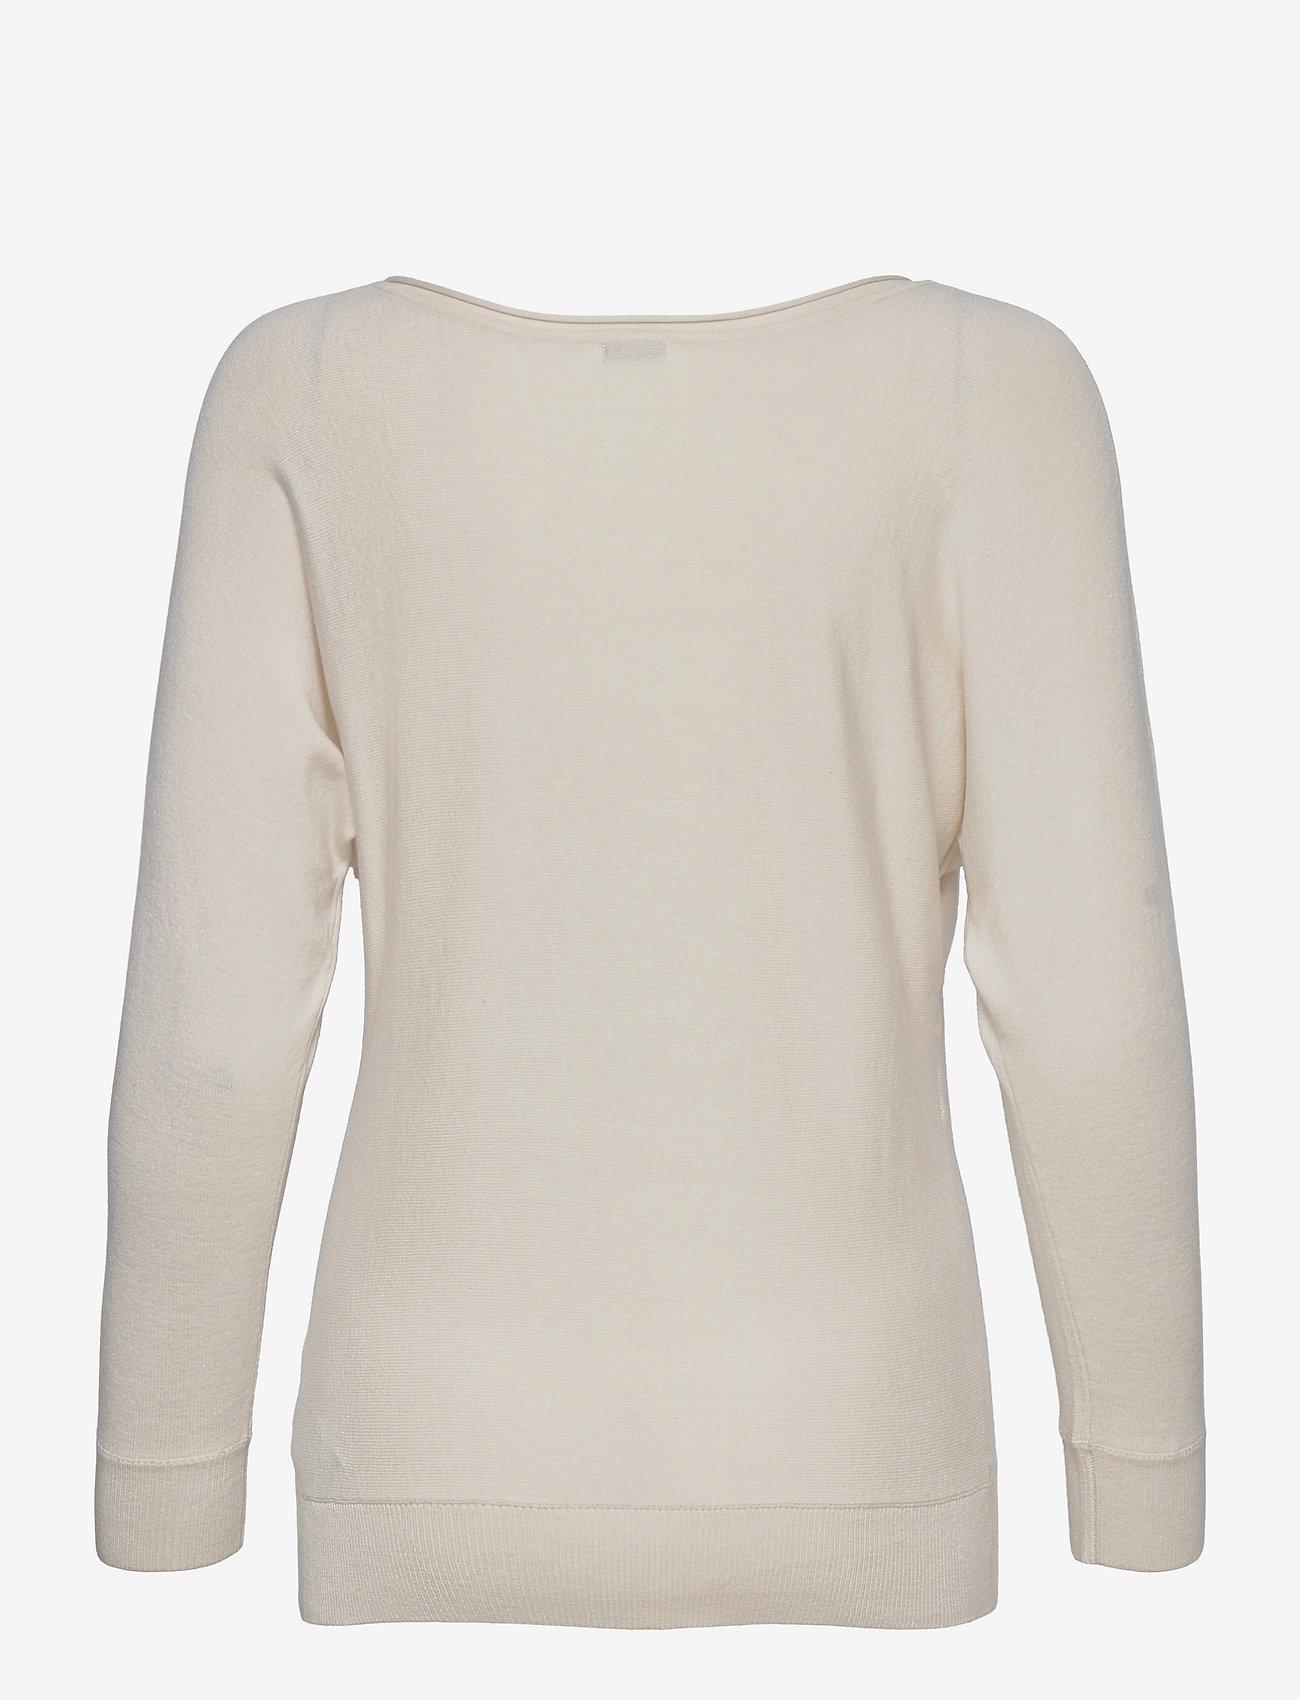 GUESS Jeans - CLAUDINE BAT SLEEVE SWTR - långärmade toppar - cream white - 1